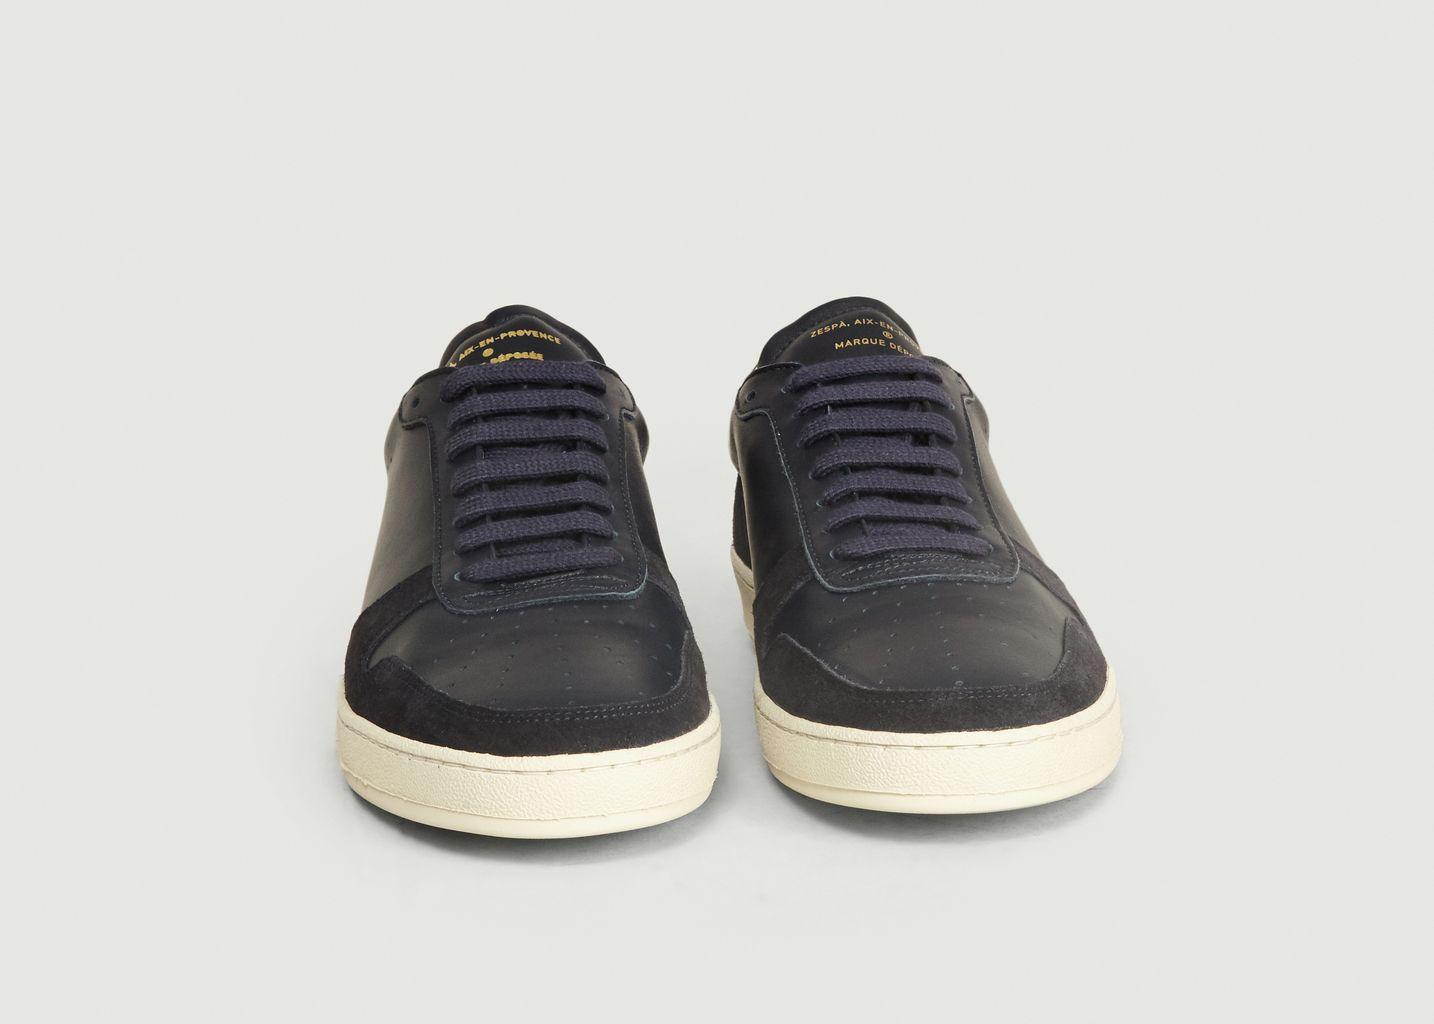 Sneakers En Cuir Nappa ZSP23 Apla - Zespa